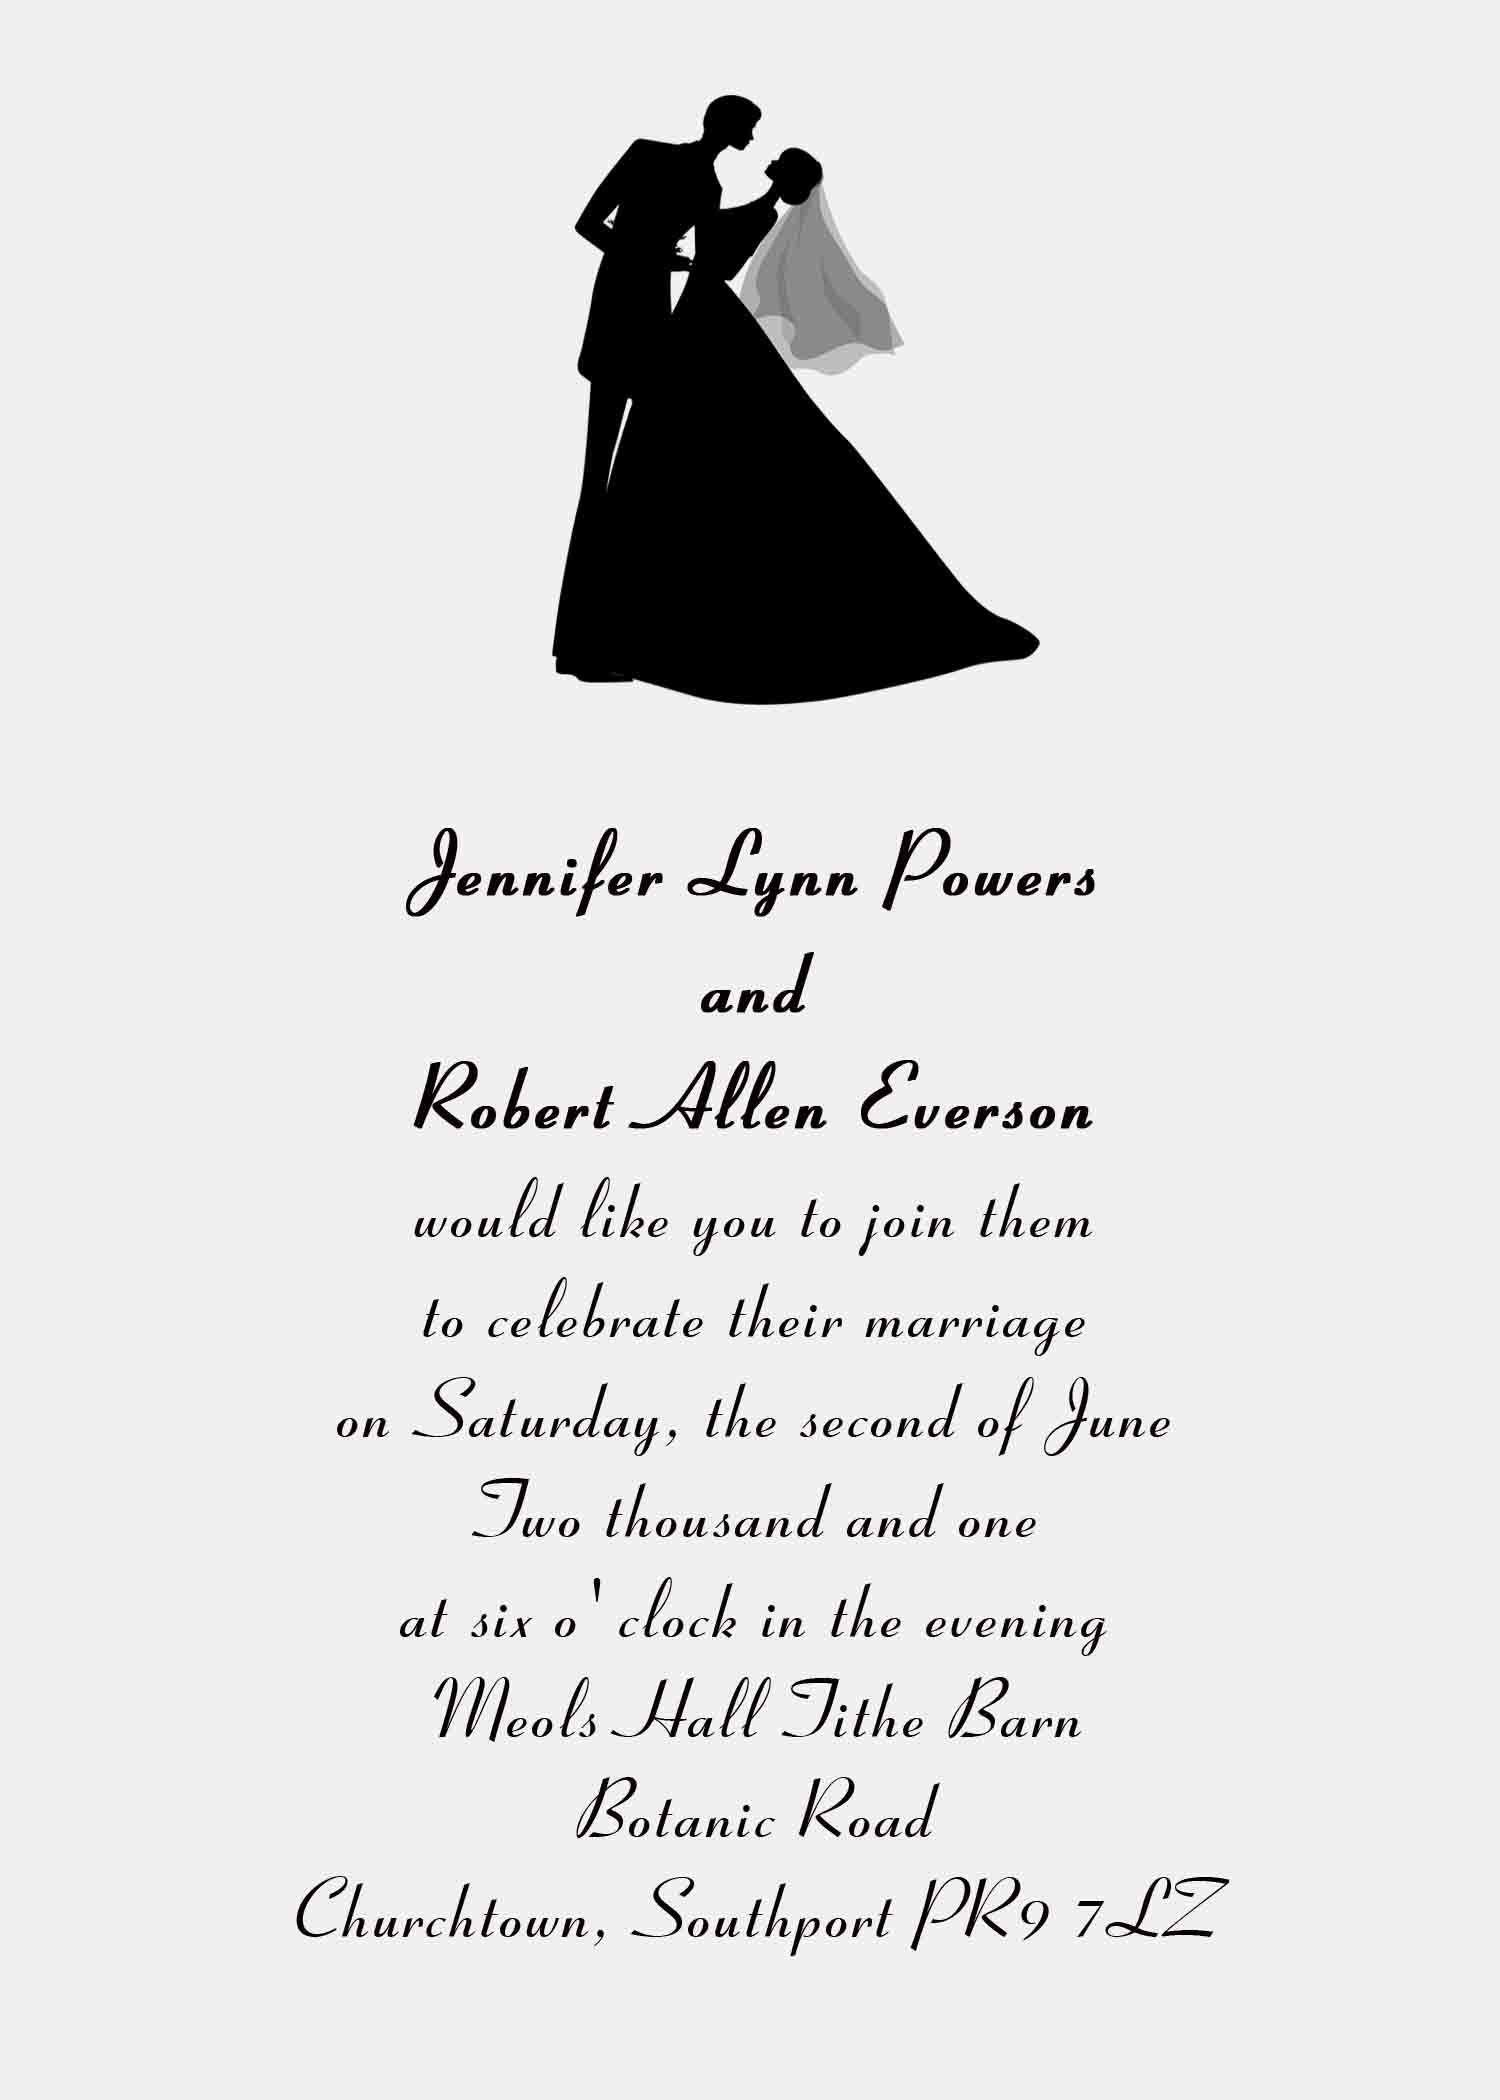 Friends Invitation Card Wordings For Wedding